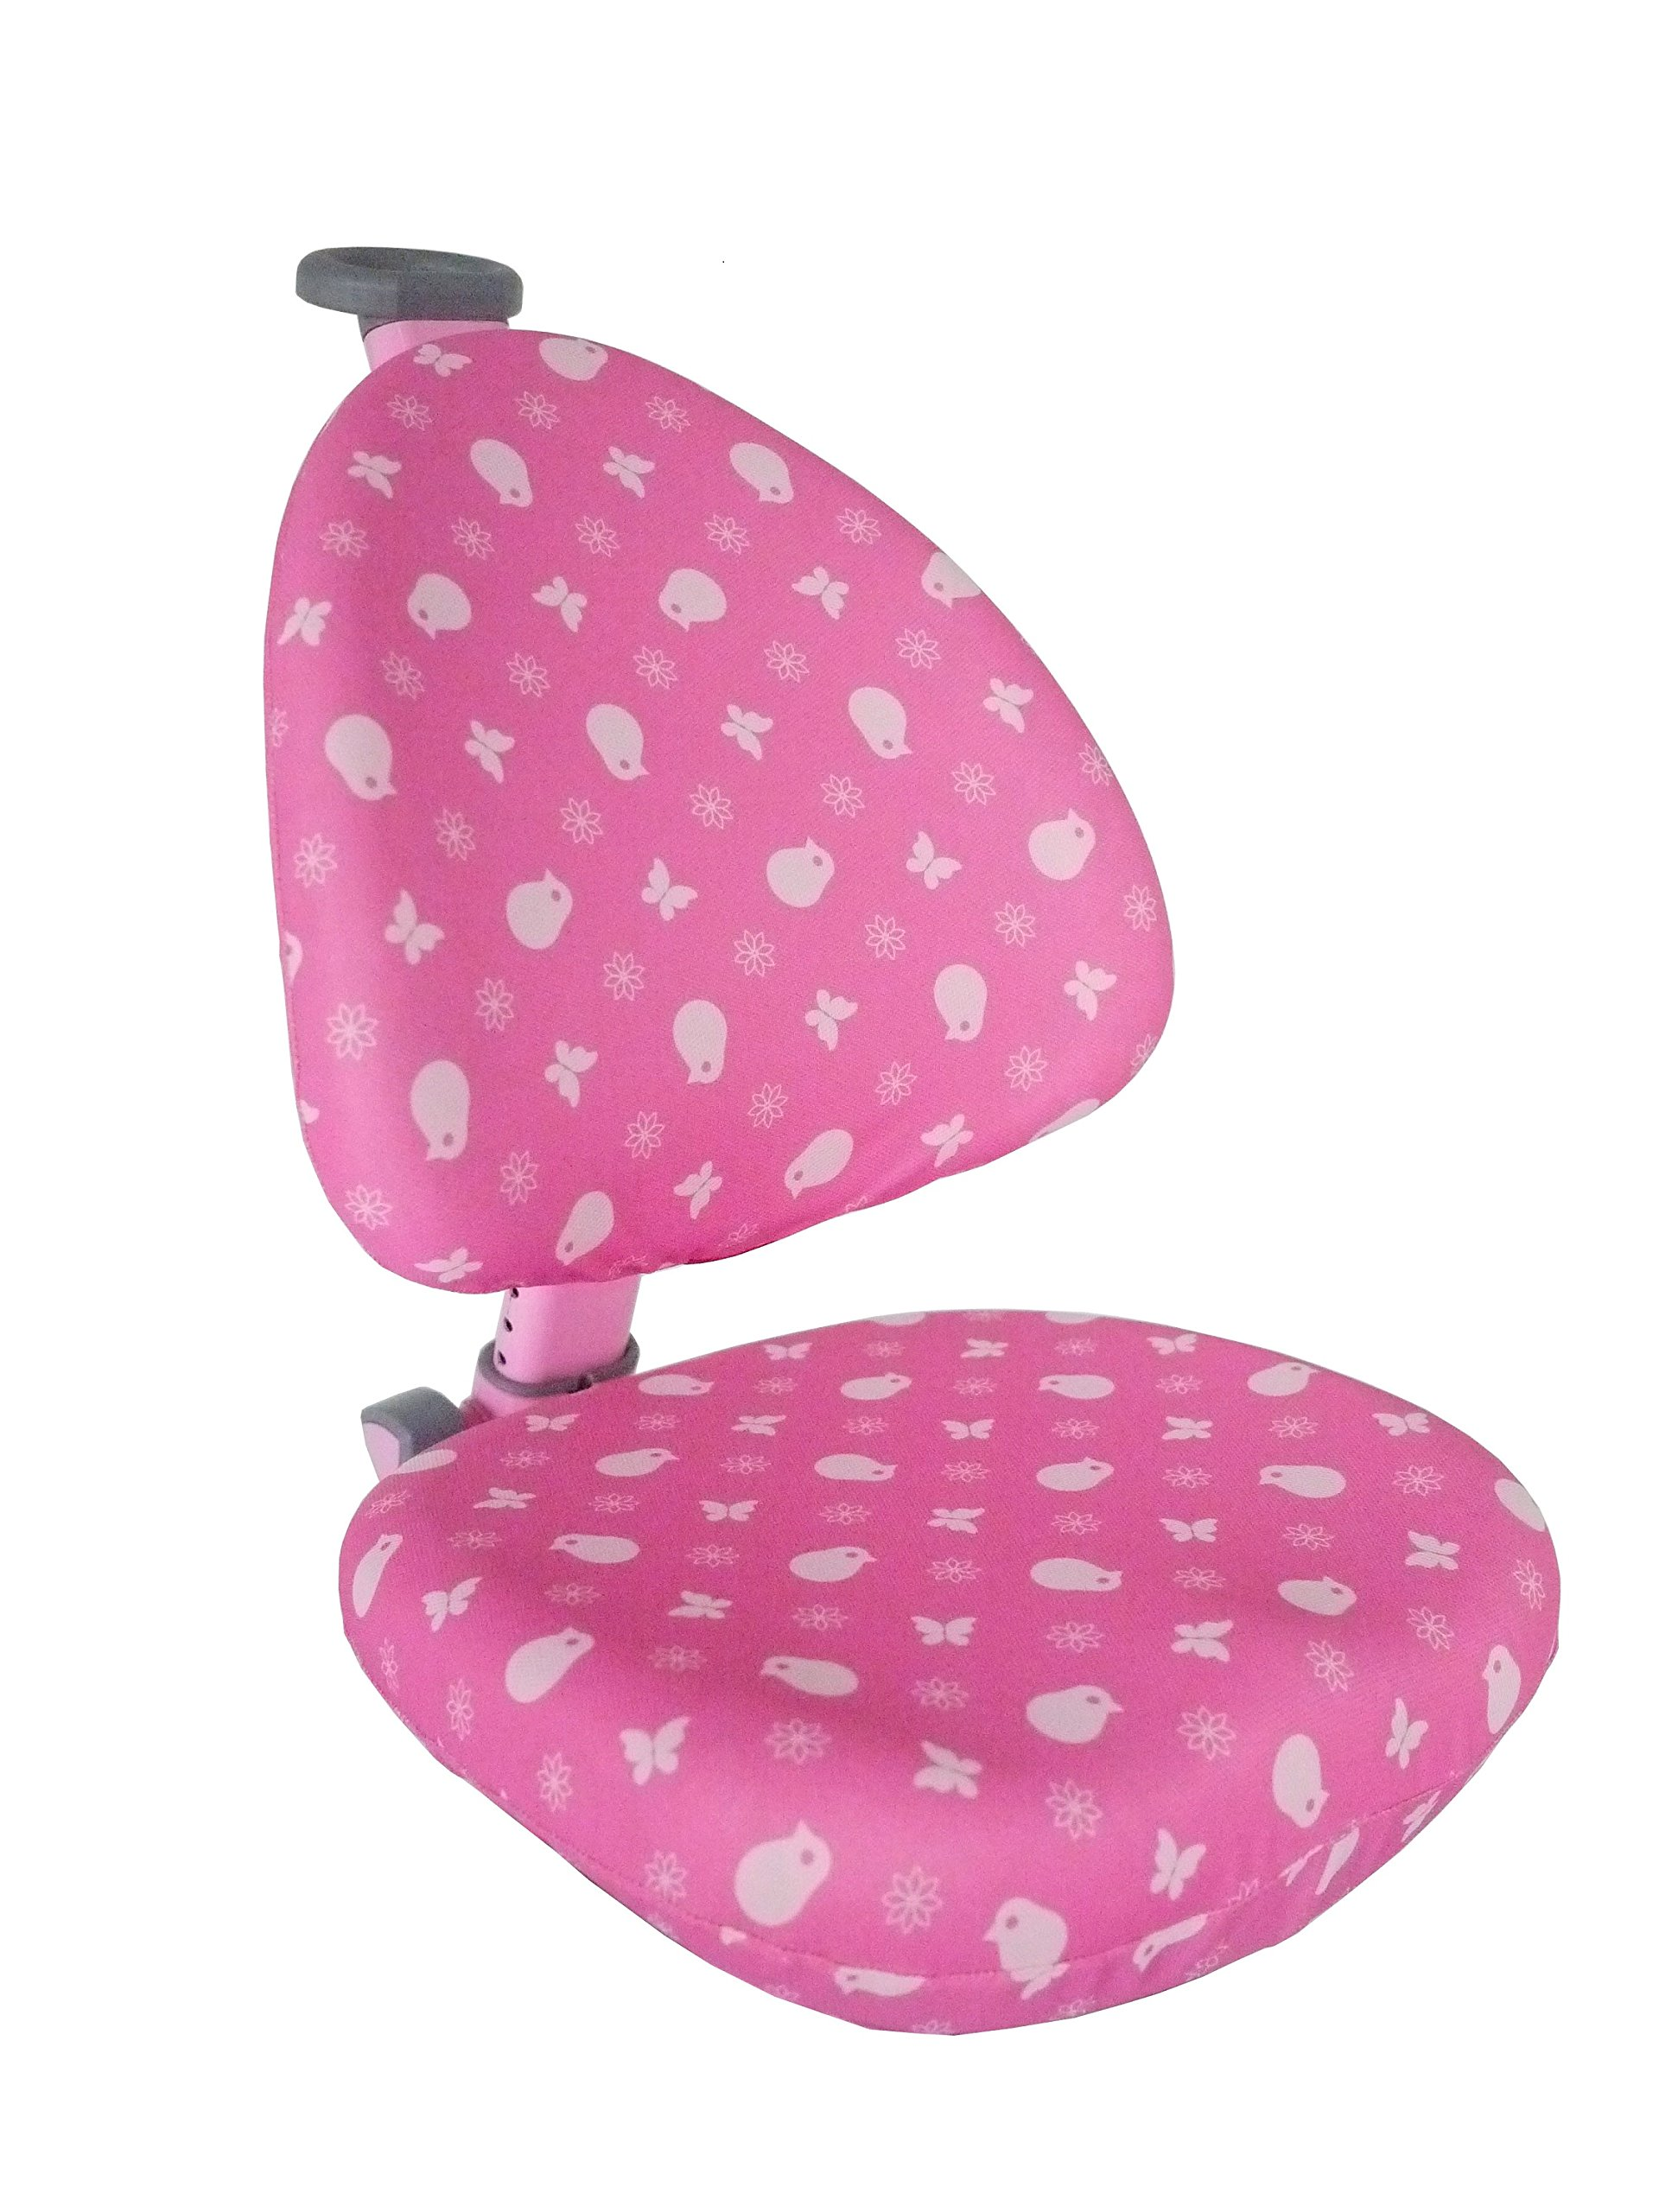 TCT Nanotec Kid 2 Youth Kid's Ergonomic Swivel Desk Chair Cover, Pink